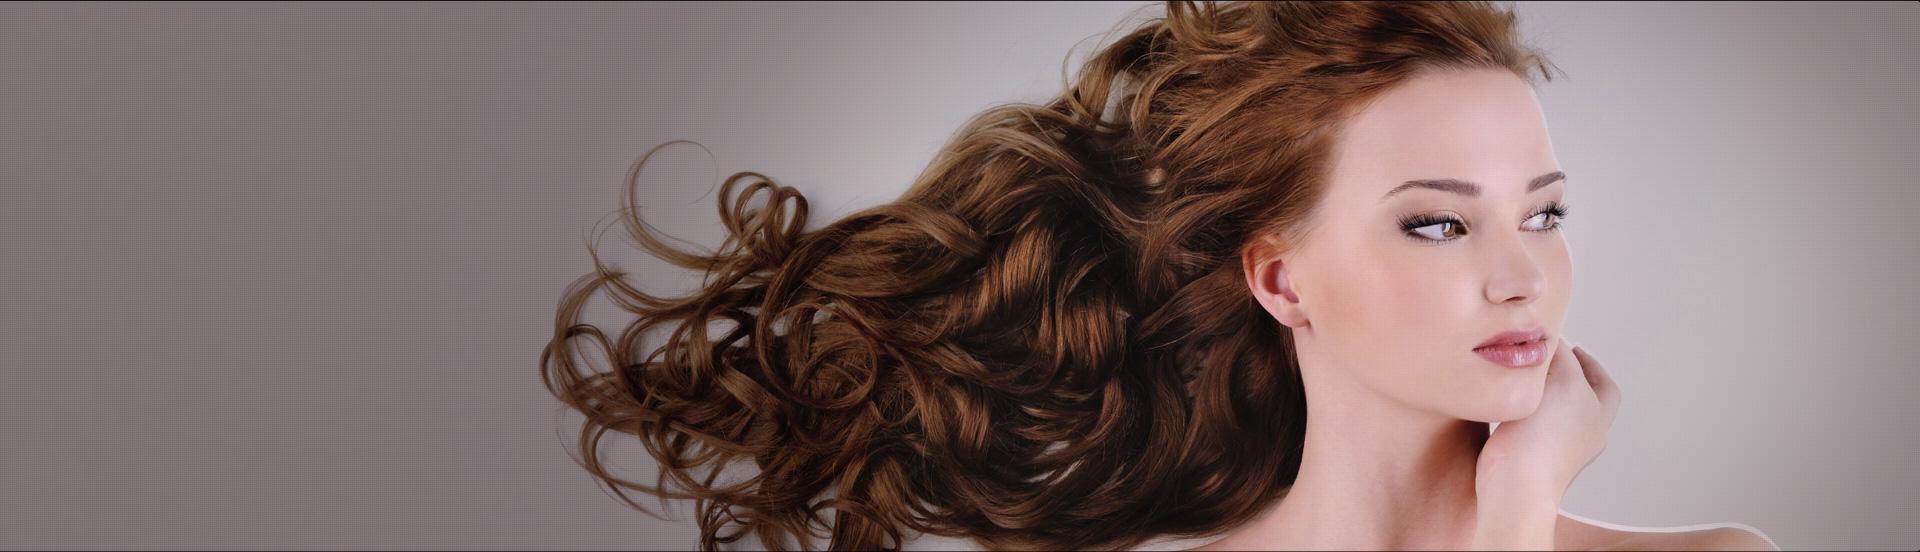 Nutley Nj Hair Salons Total Image Hair Designers Bridal Updos